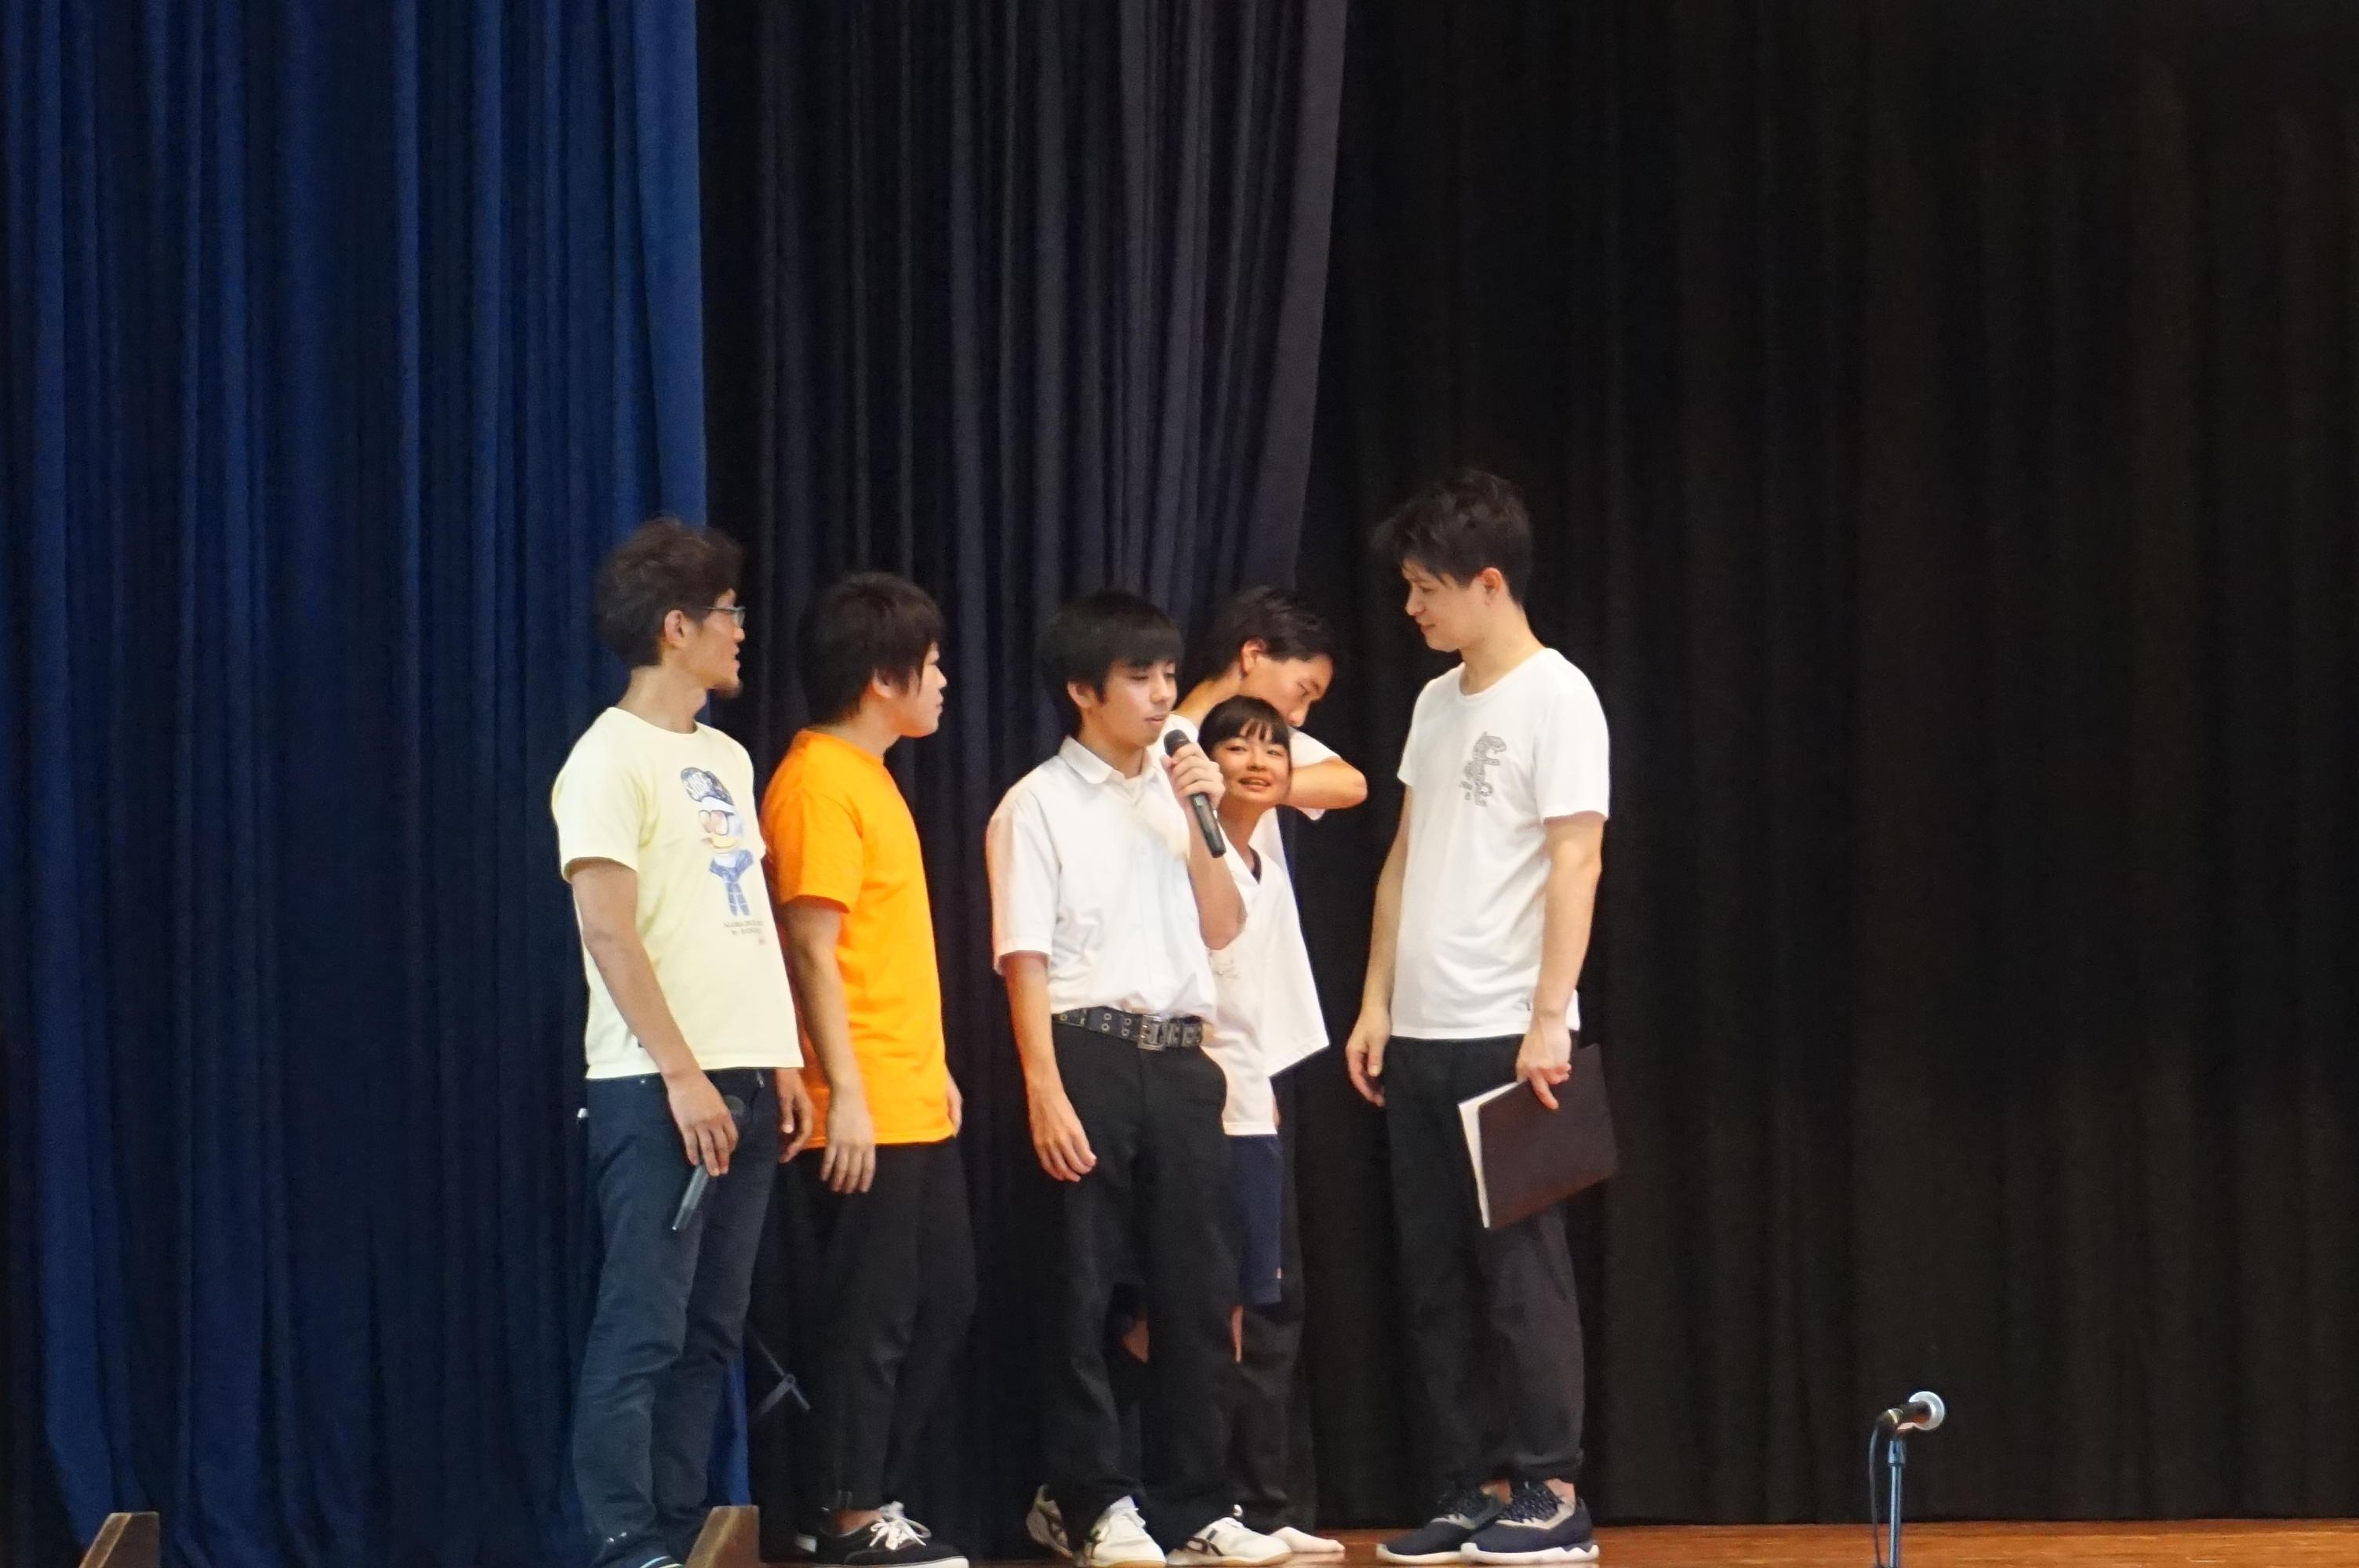 http://news.yoshimoto.co.jp/20170912123856-769654afa263c79a120abe313e34667cff54ca0a.jpg